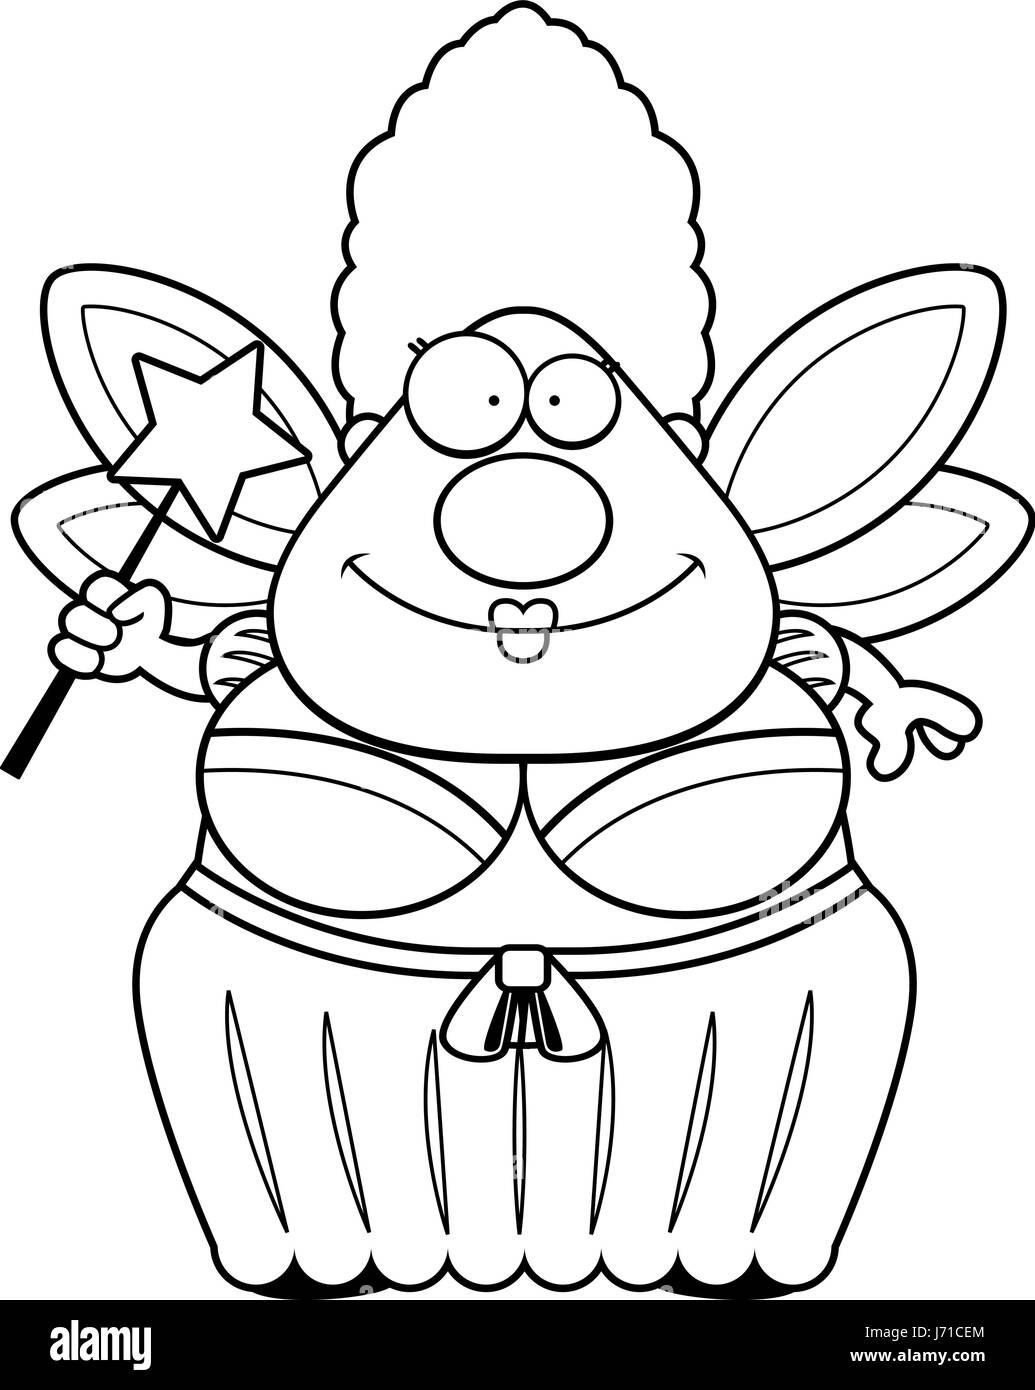 Fairy Wand Cartoon Black And White Stock Photos Images Alamy